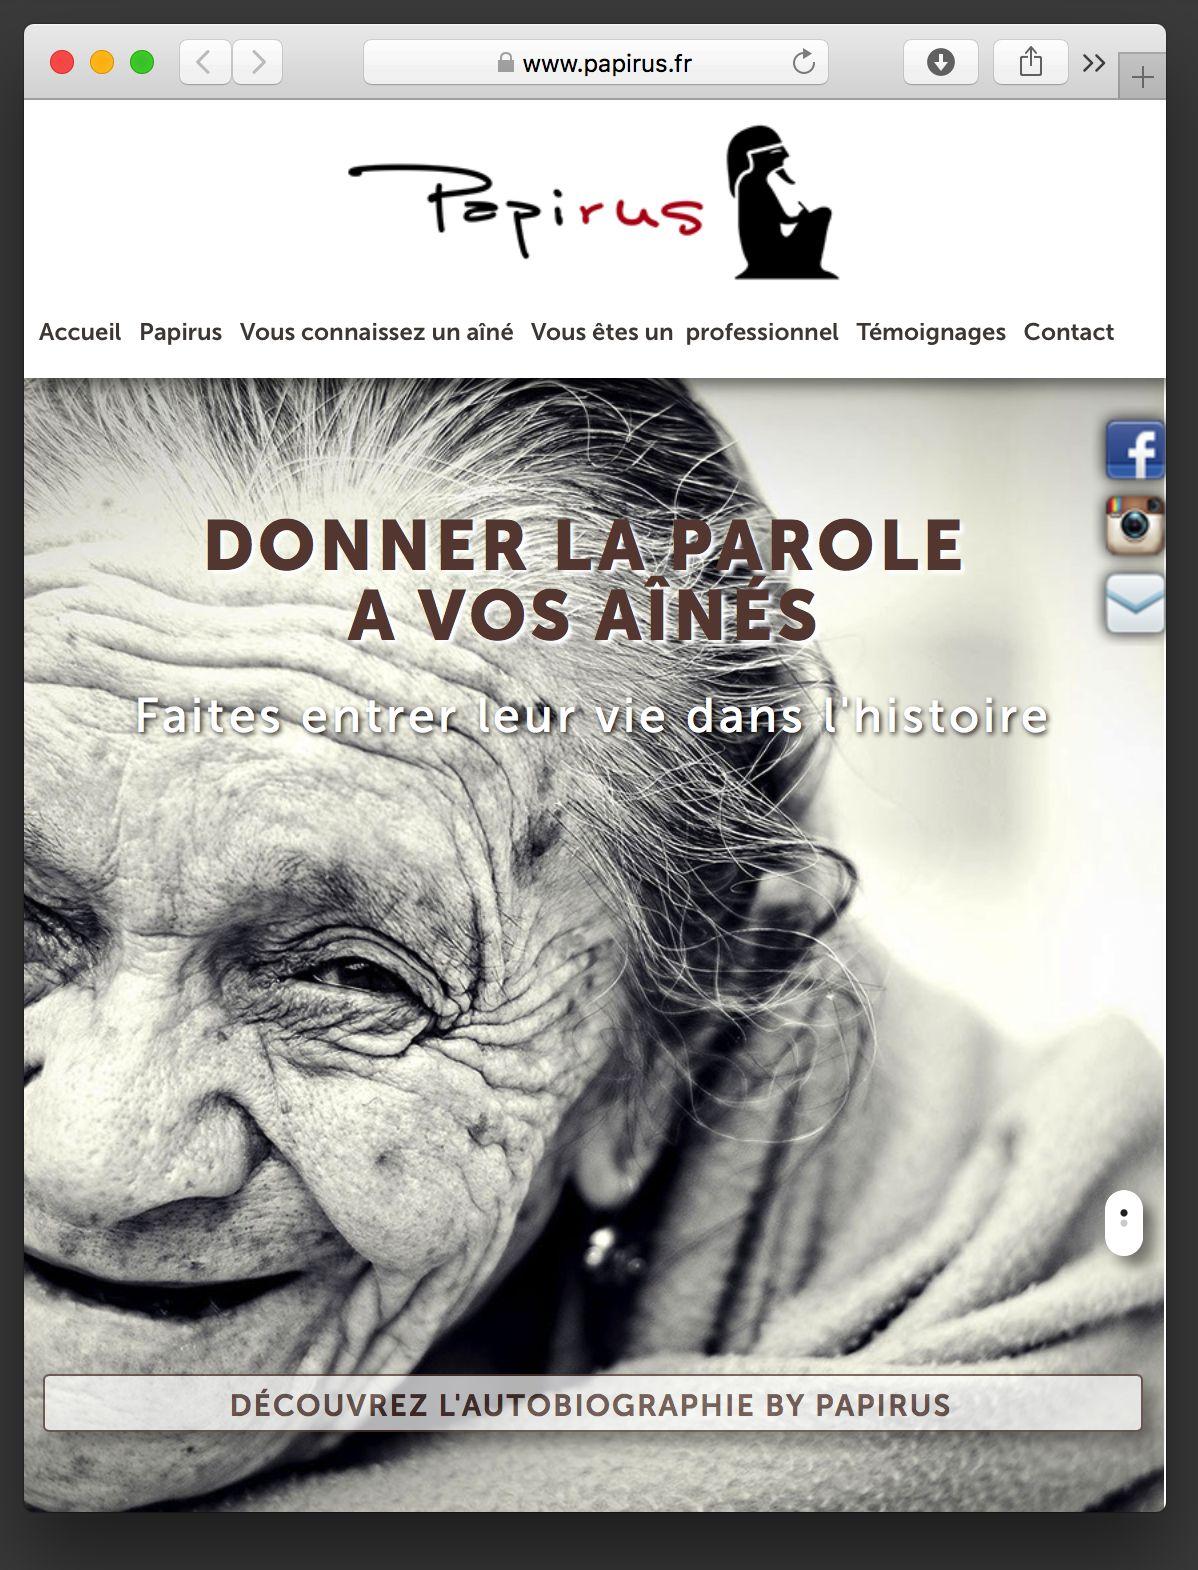 www.papirus.fr